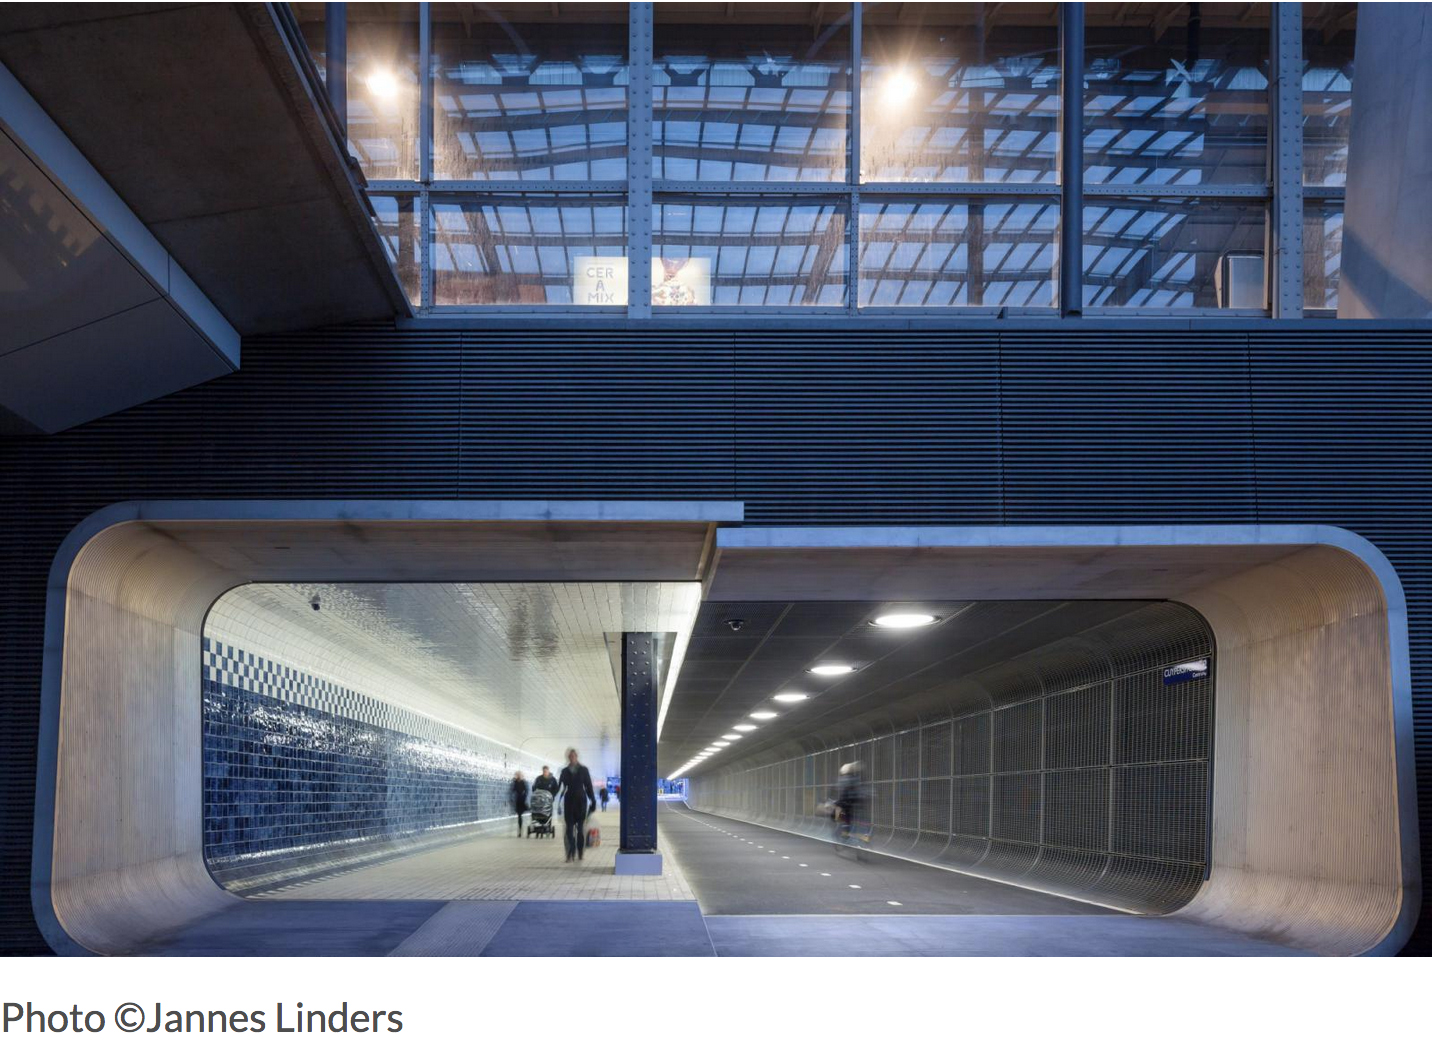 ditail-ceramica-pavimiento-el-tunel-cuyperspassage